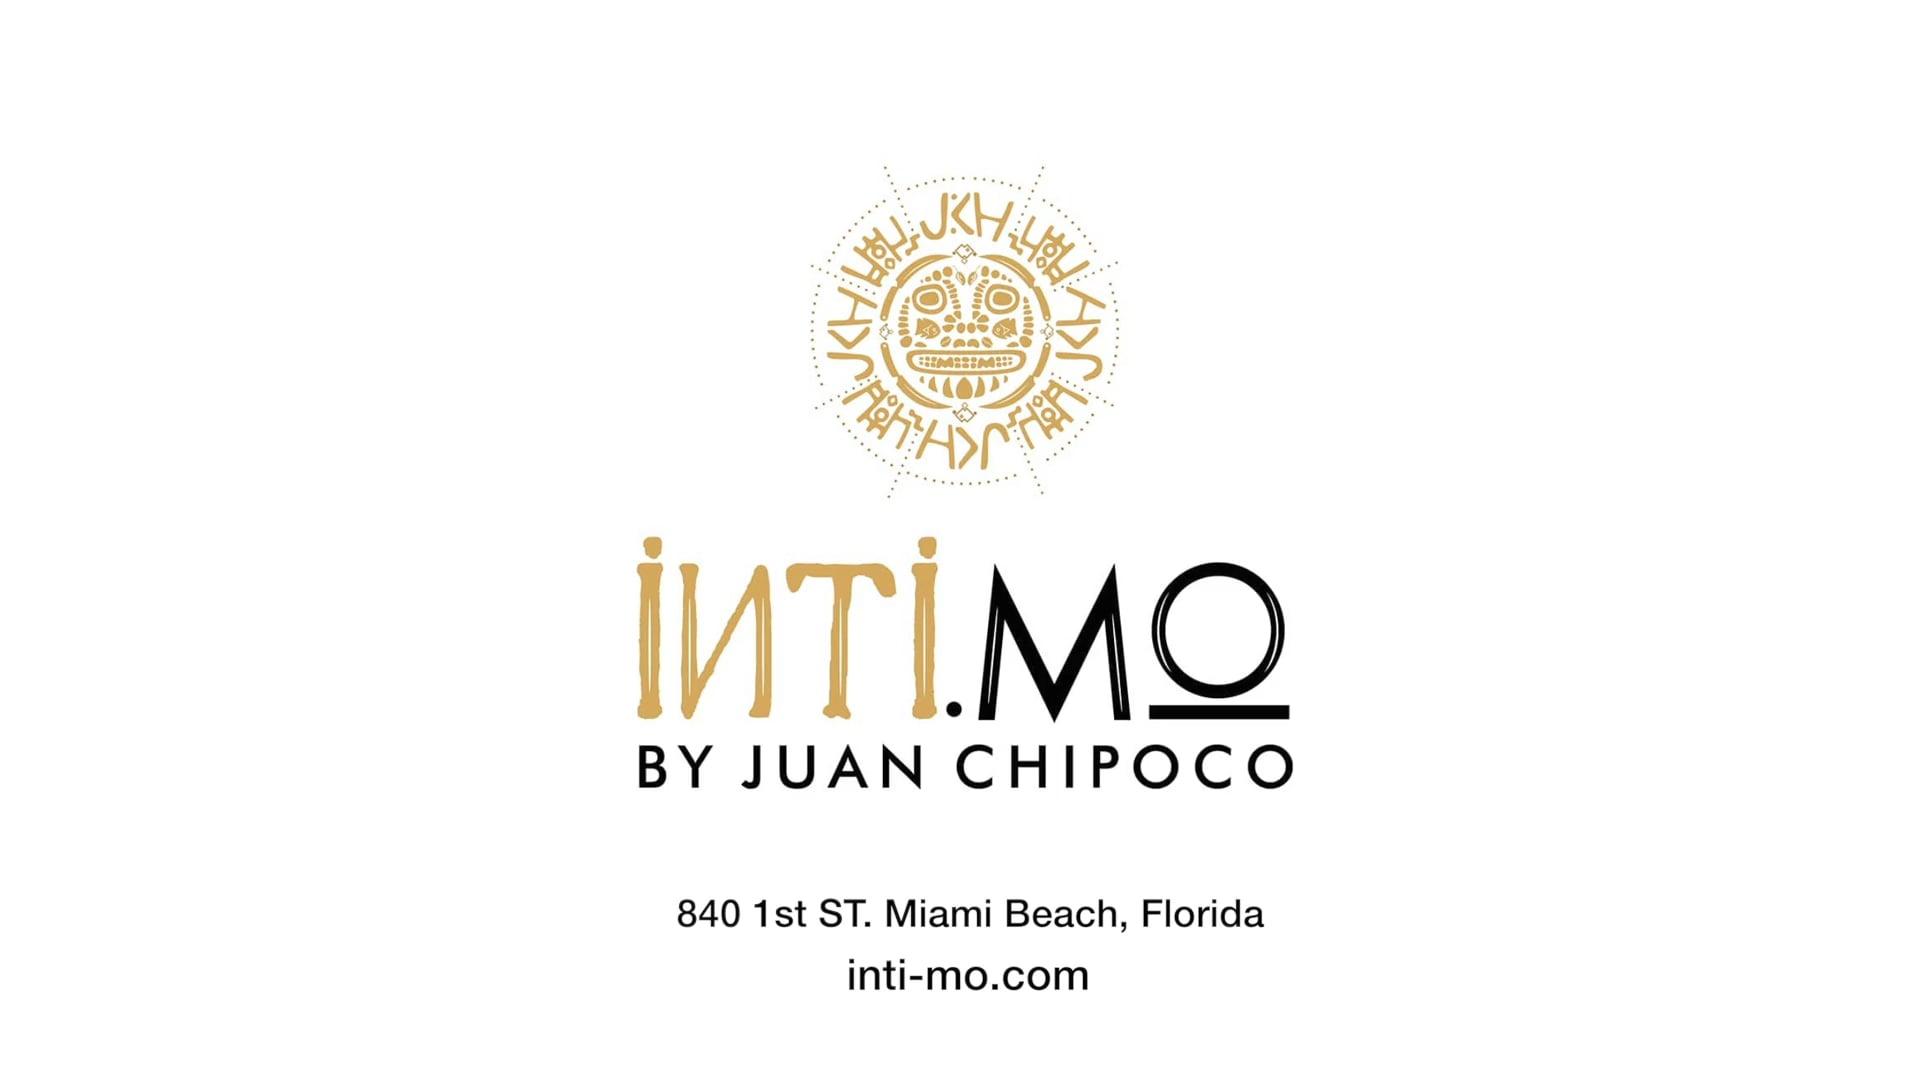 Intimo by Juan Chipoco